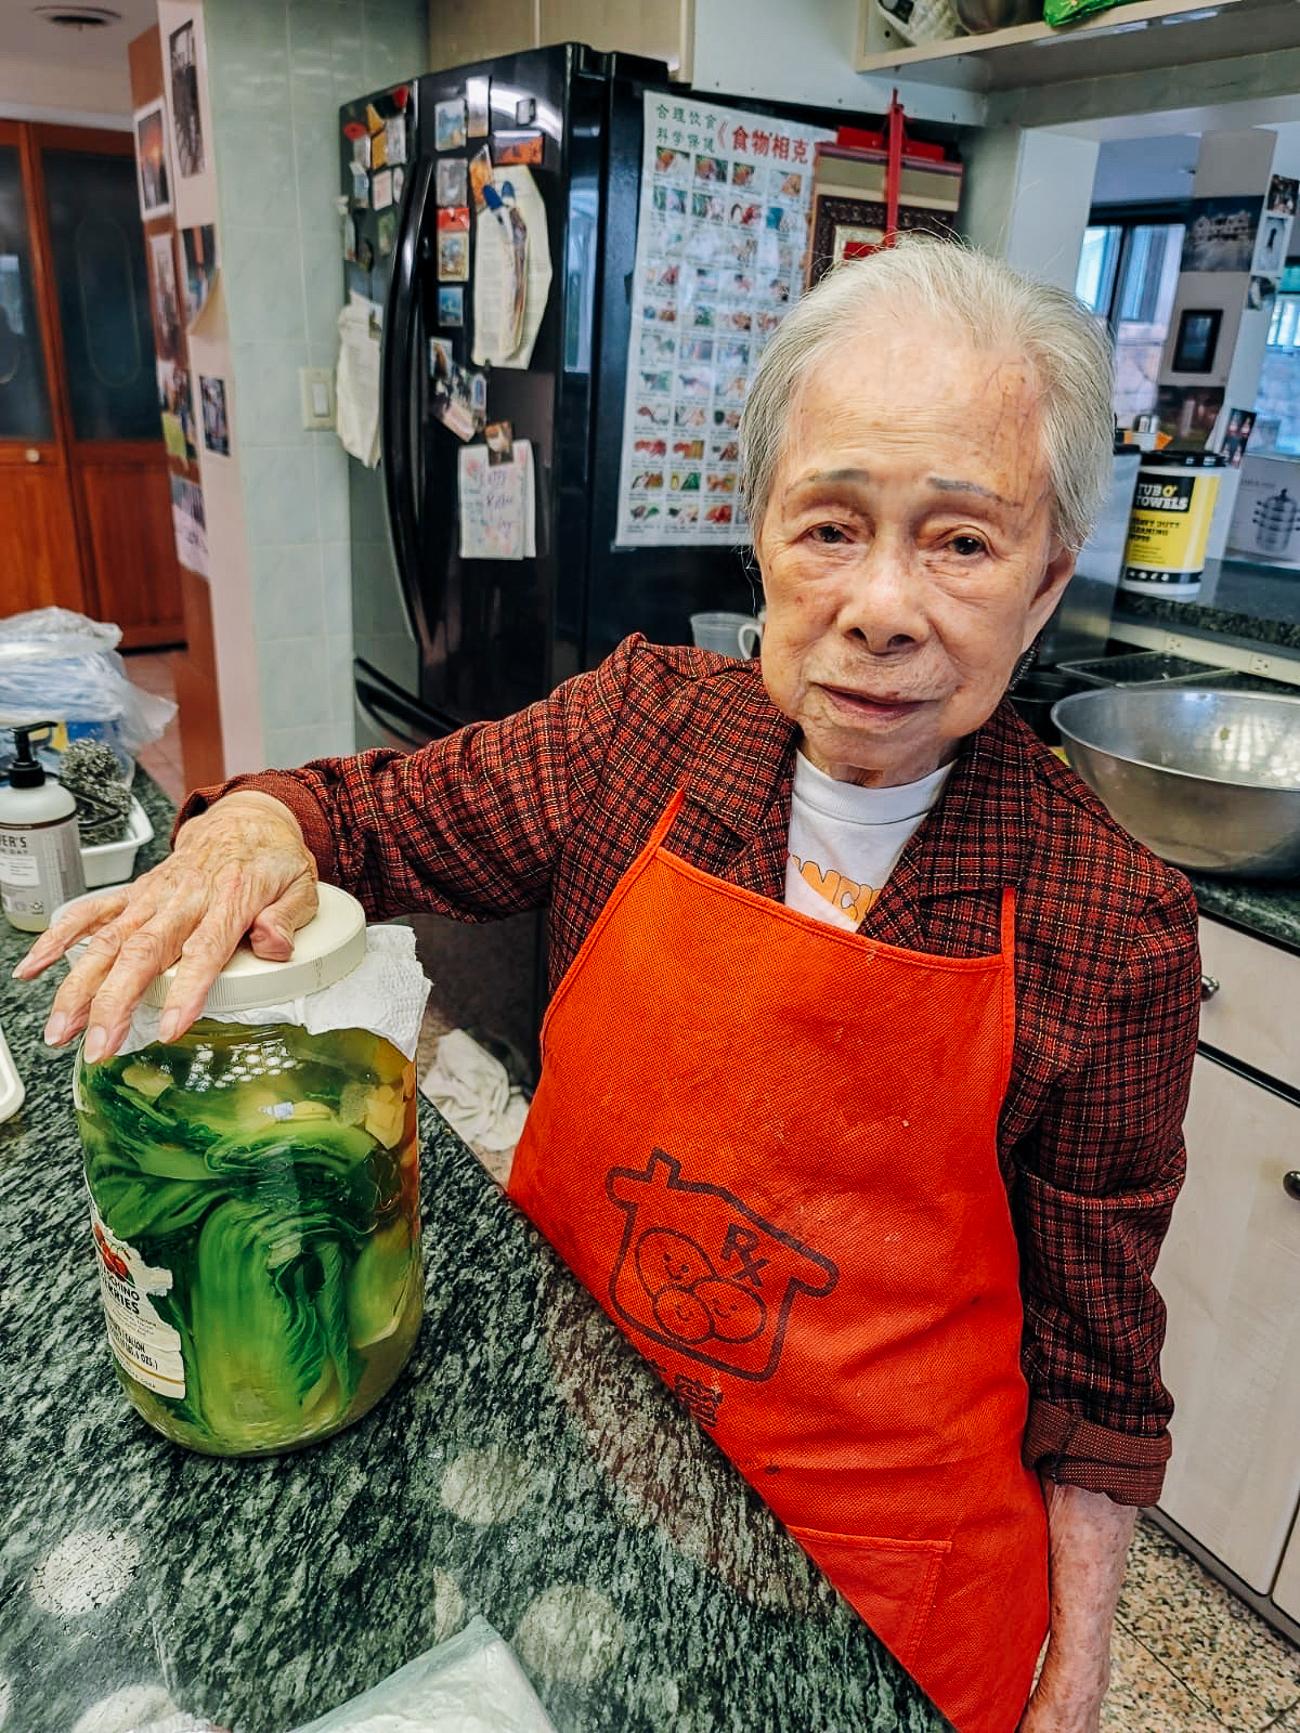 Bill's grandma with her homemade ham choy